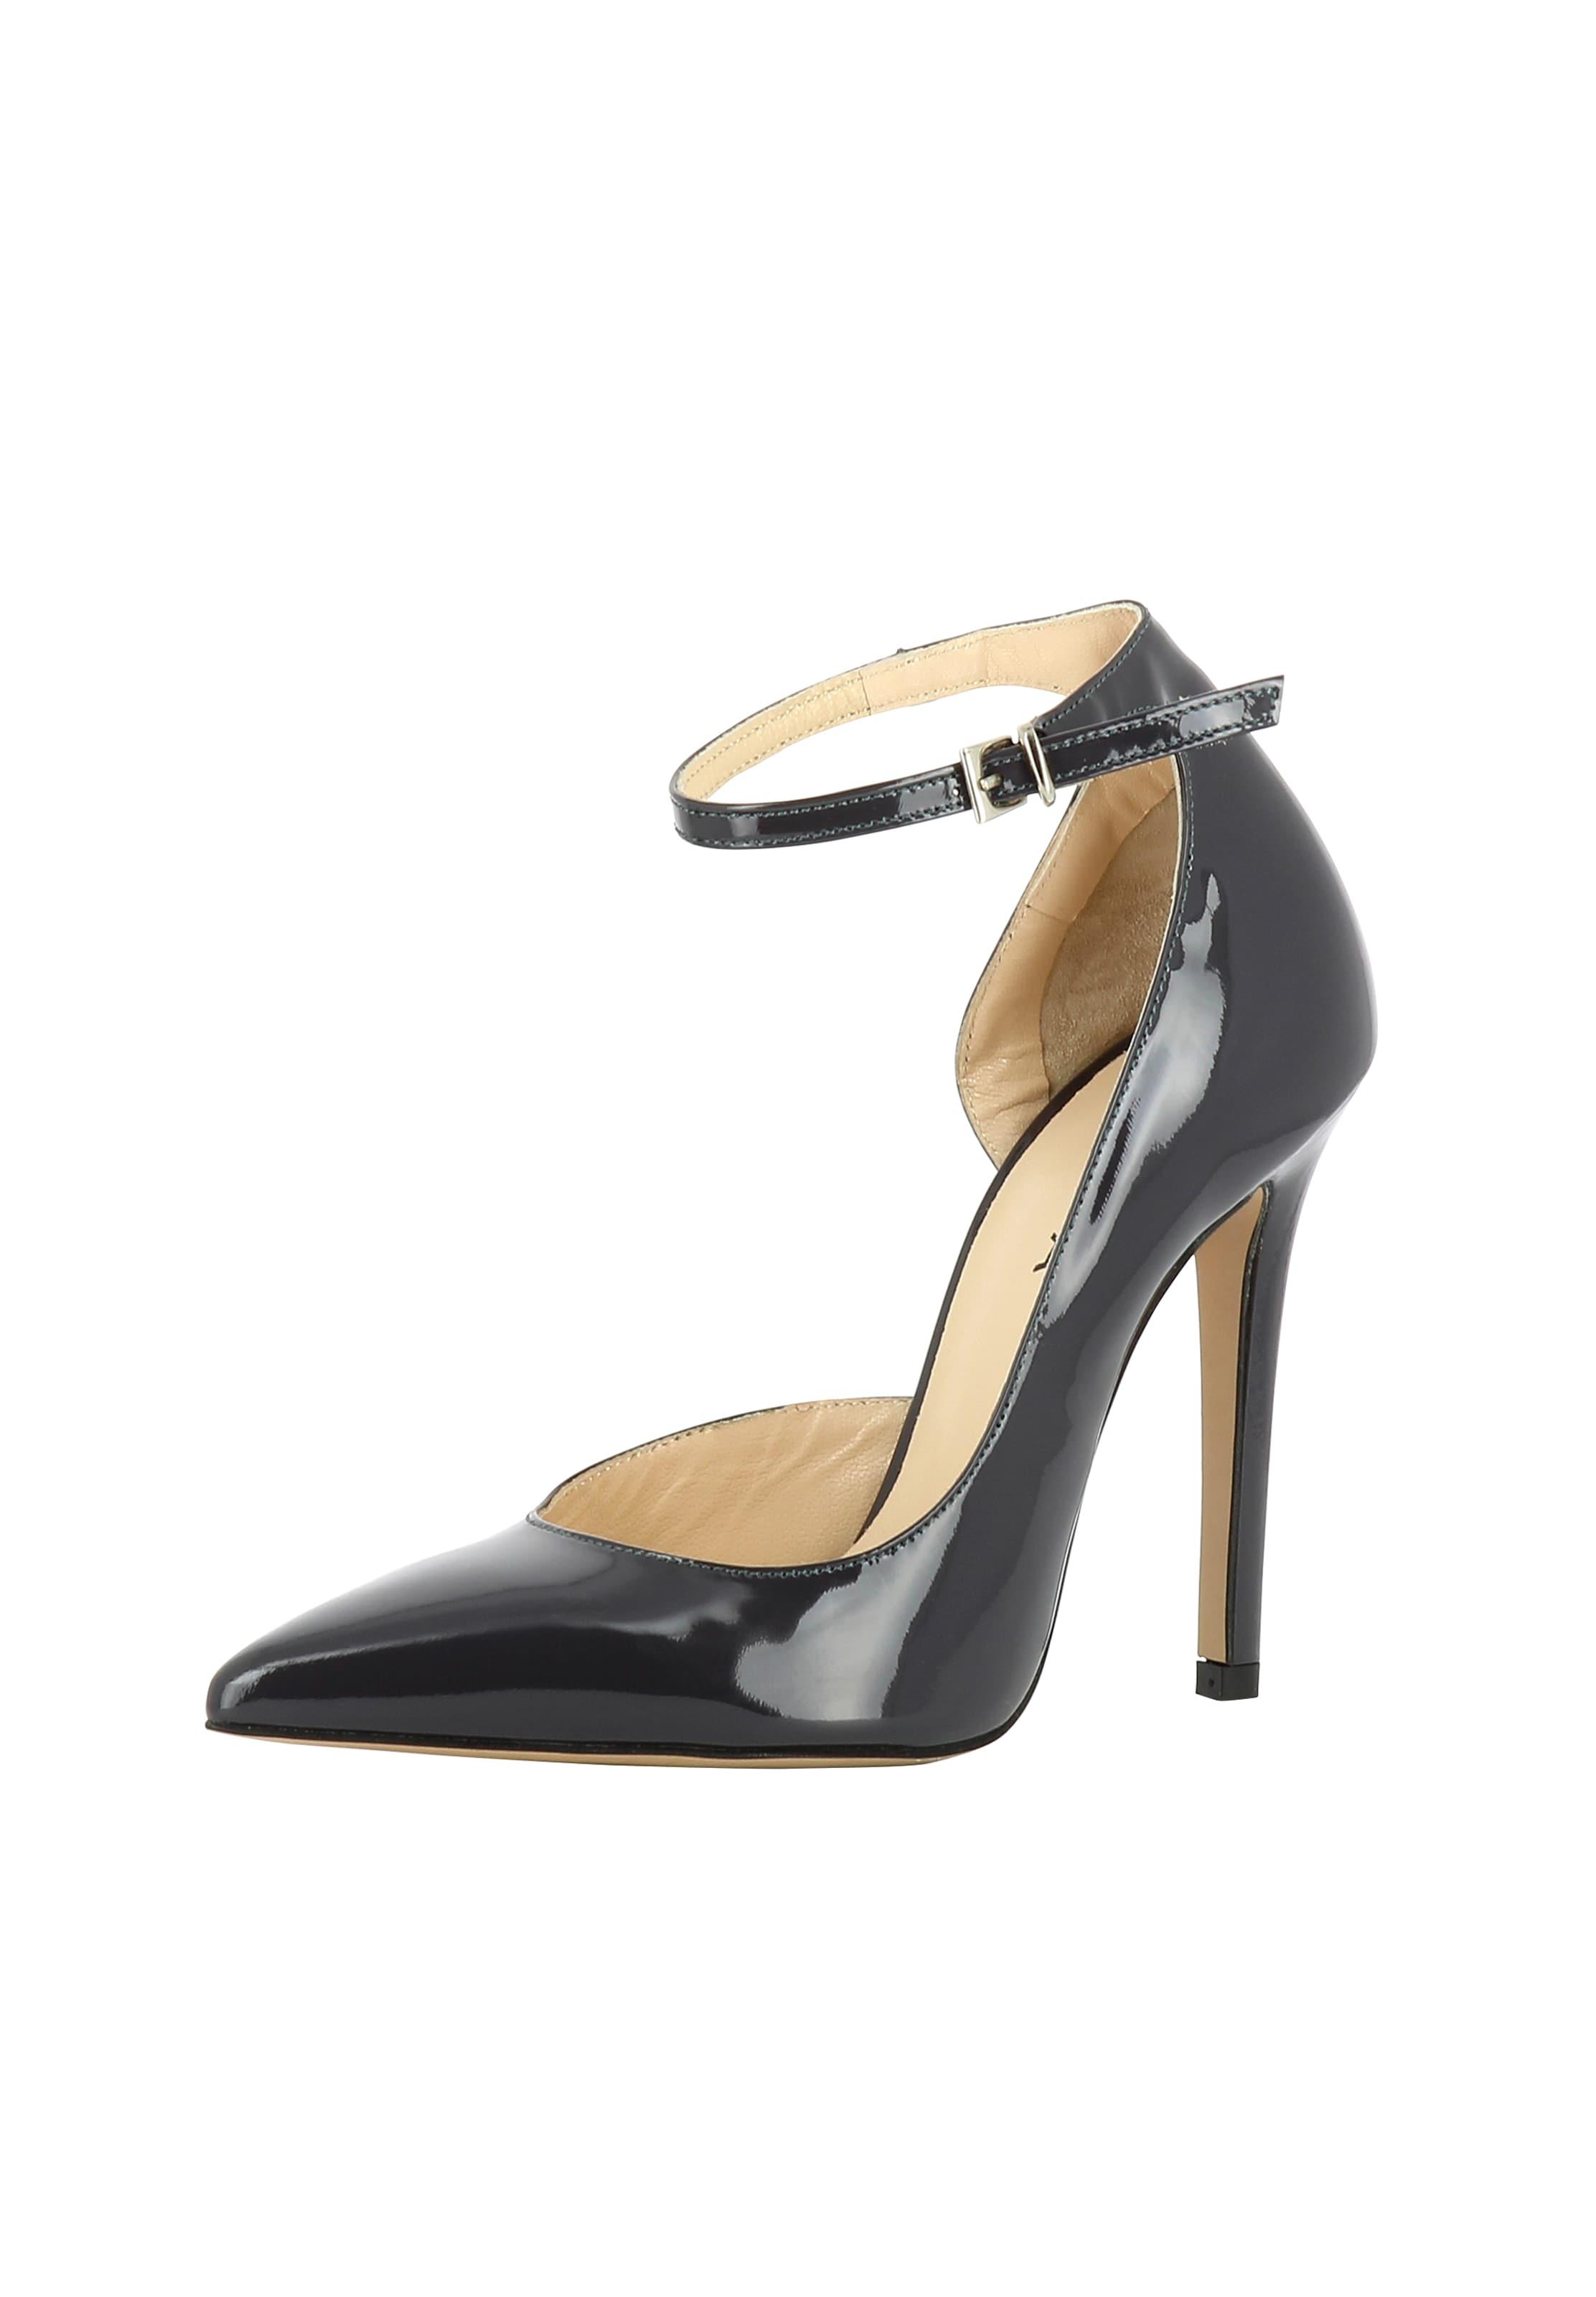 EVITA Damen Pumps Pumps Damen LISA Verschleißfeste billige Schuhe c339da